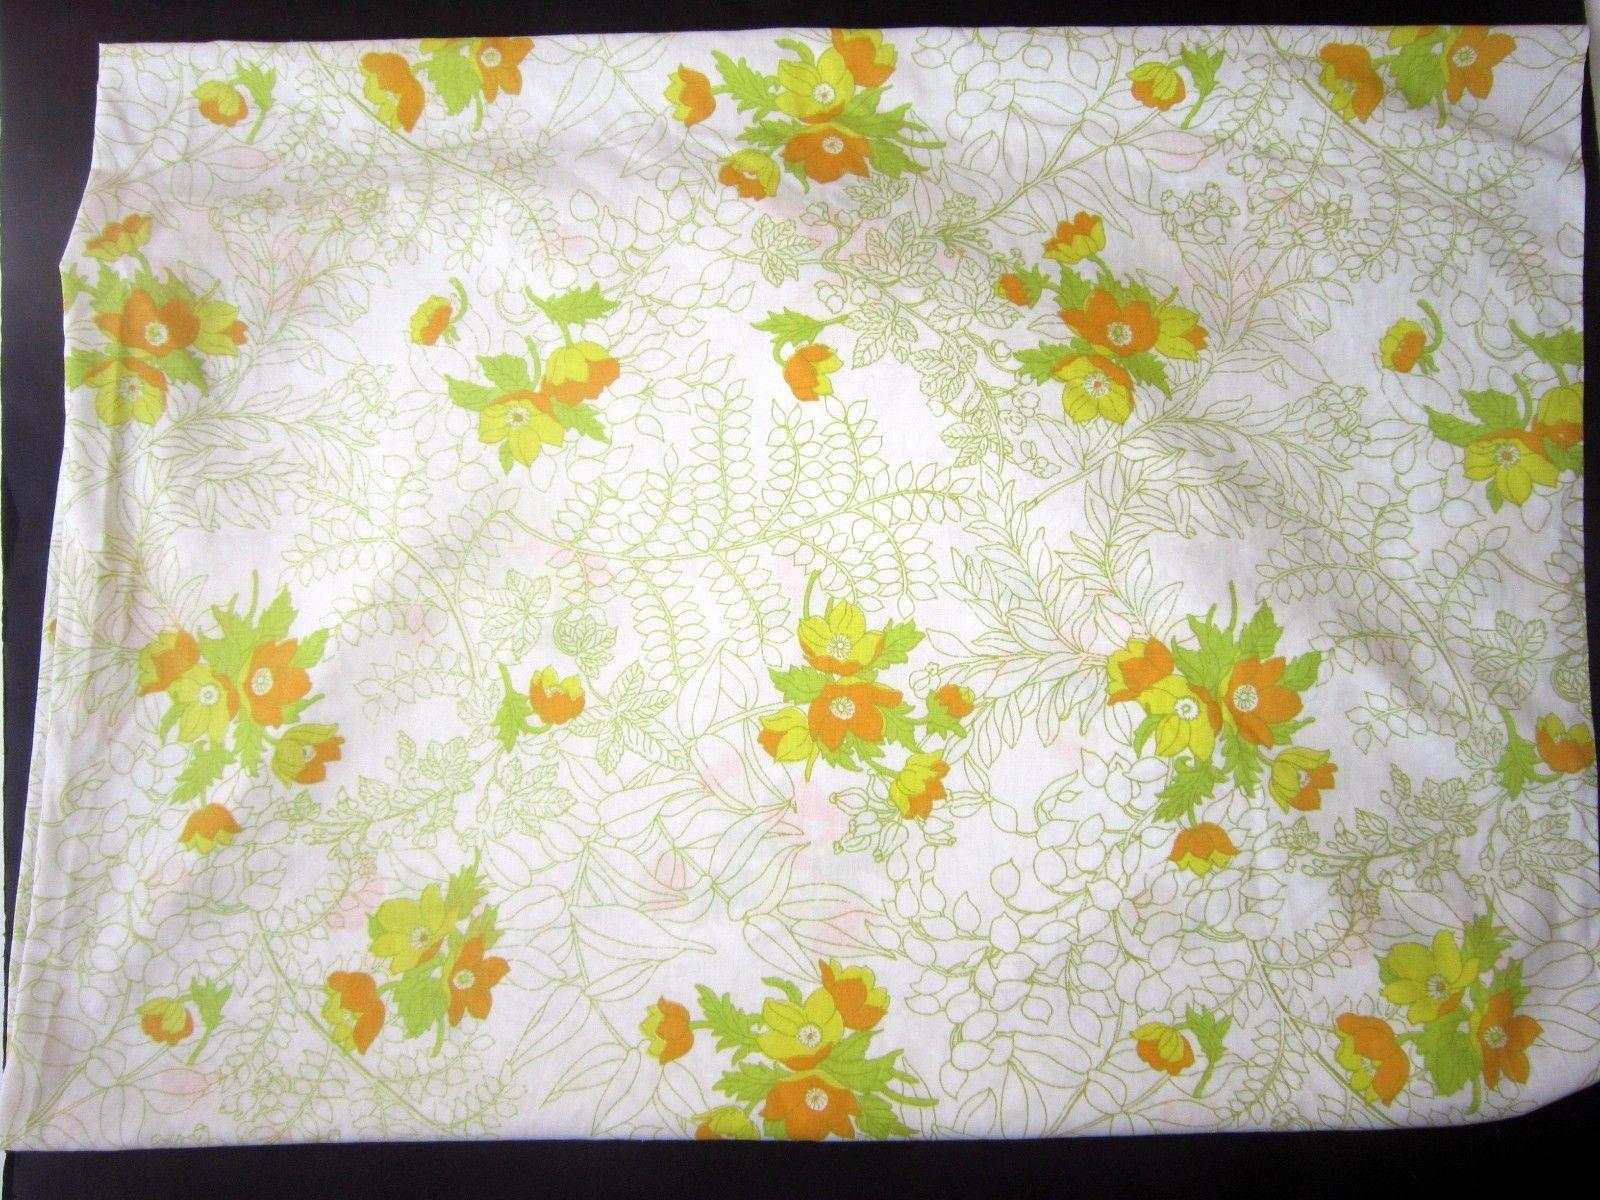 vintage retro double sheet bedding fabric linens Fieldcrest Vintag sheet double or full size flat size floral stripes